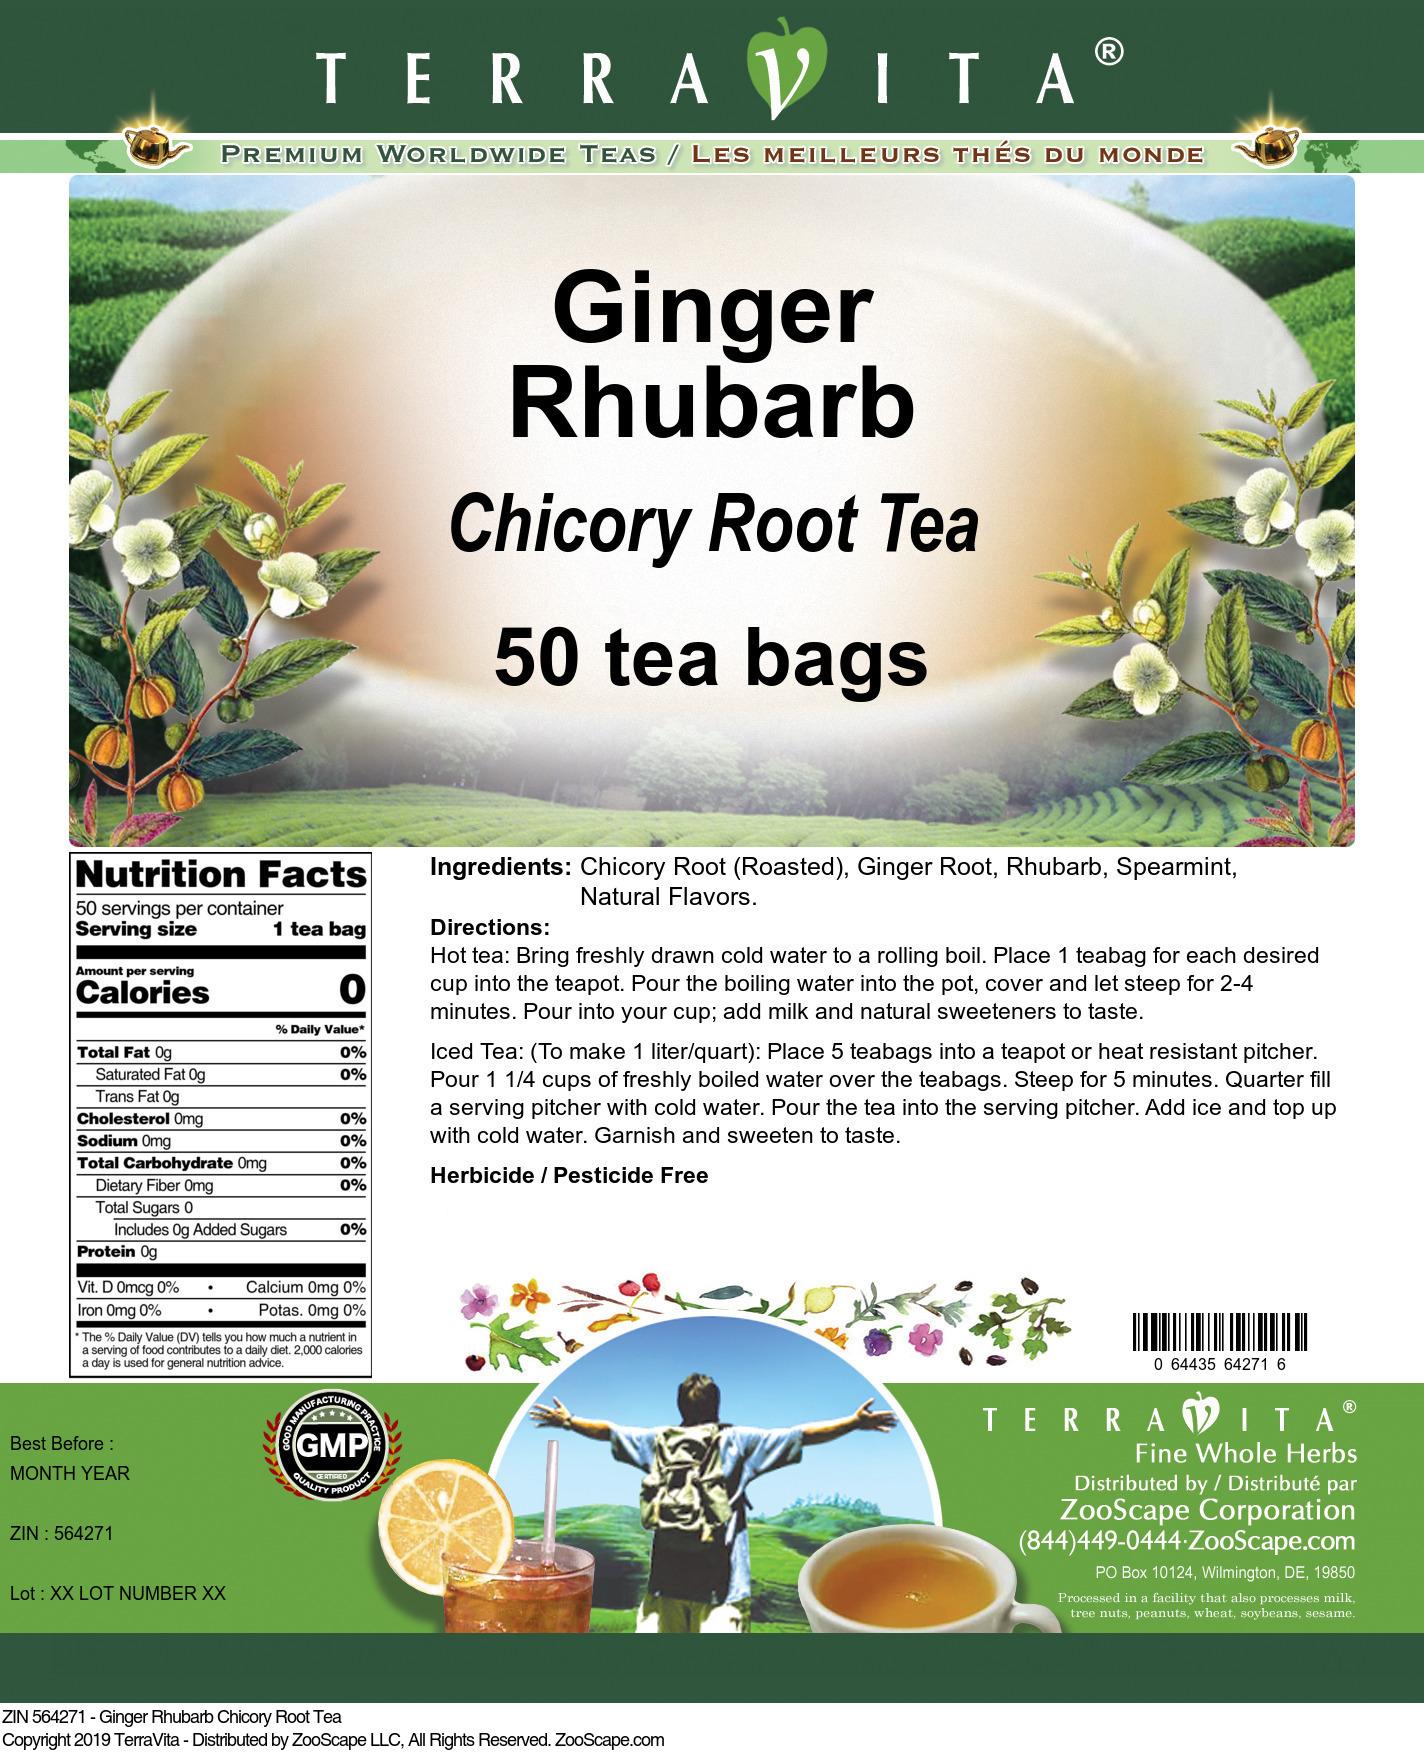 Ginger Rhubarb Chicory Root Tea